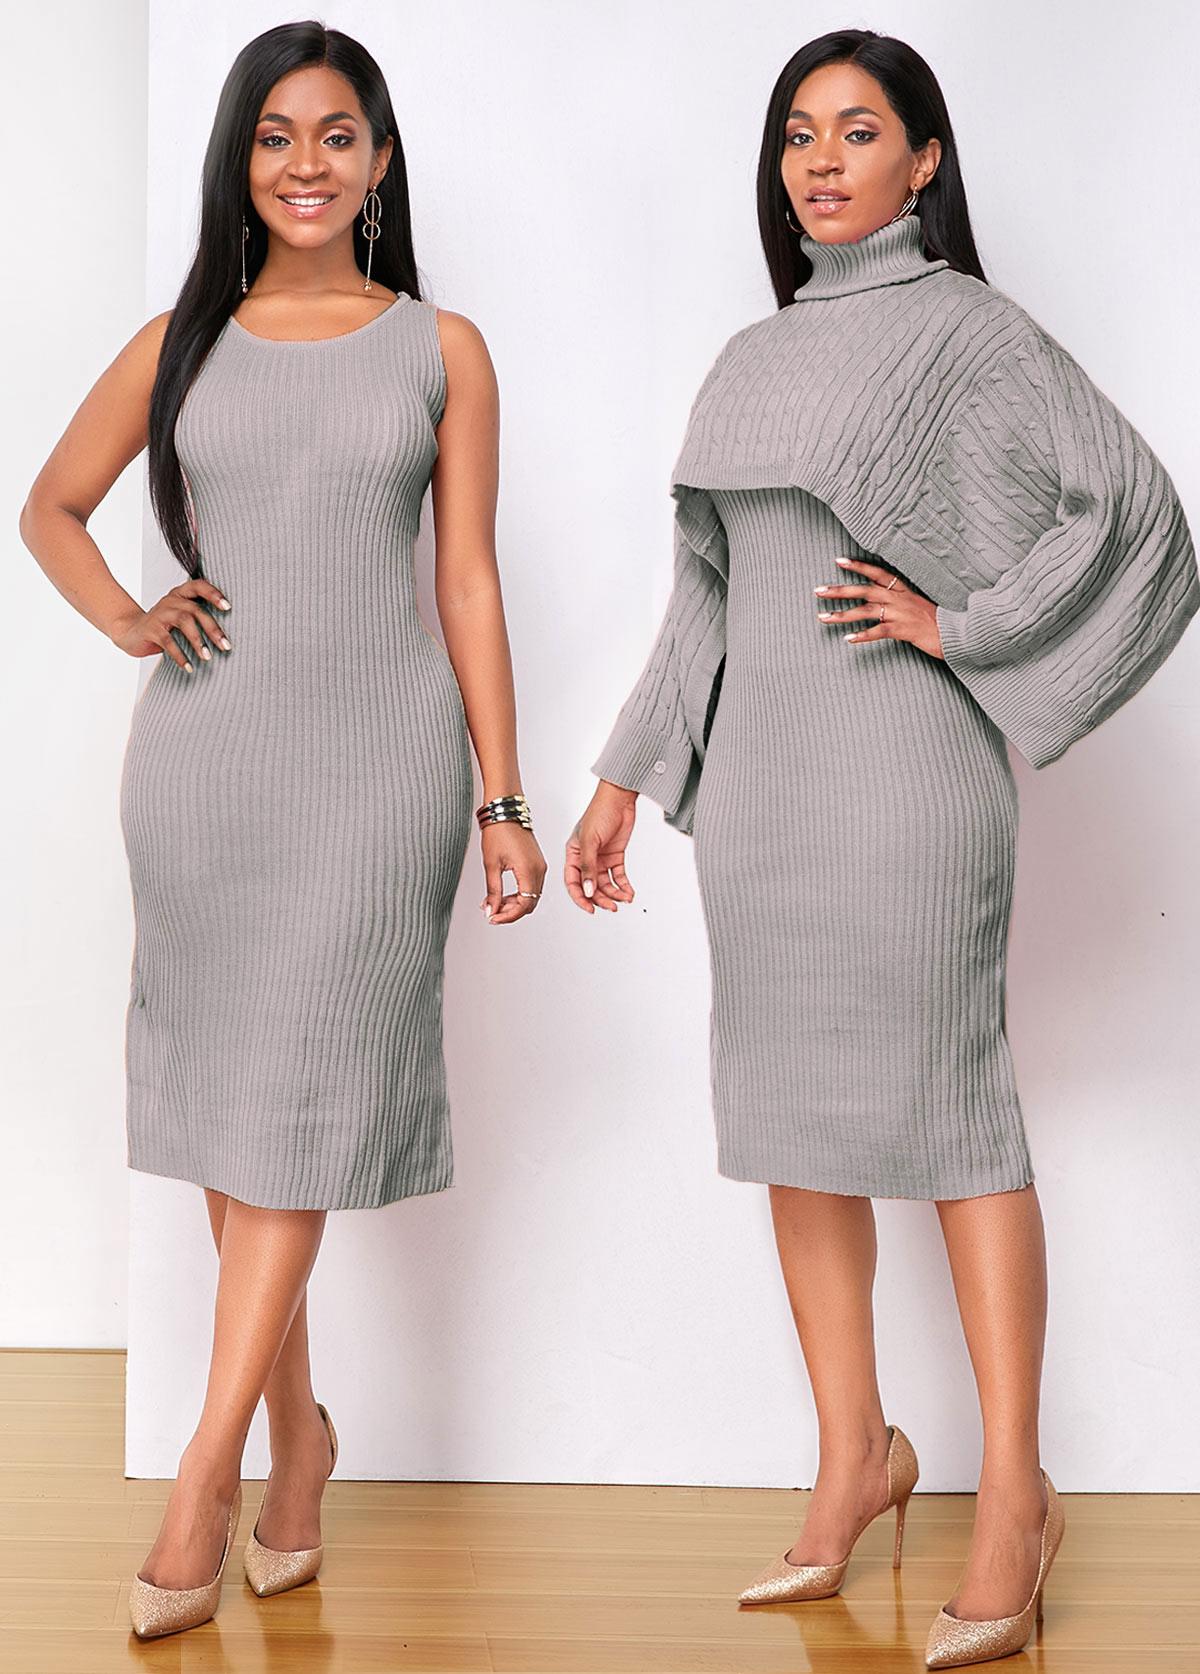 ROTITA Turtleneck Top and Sleeveless Sweater Dress